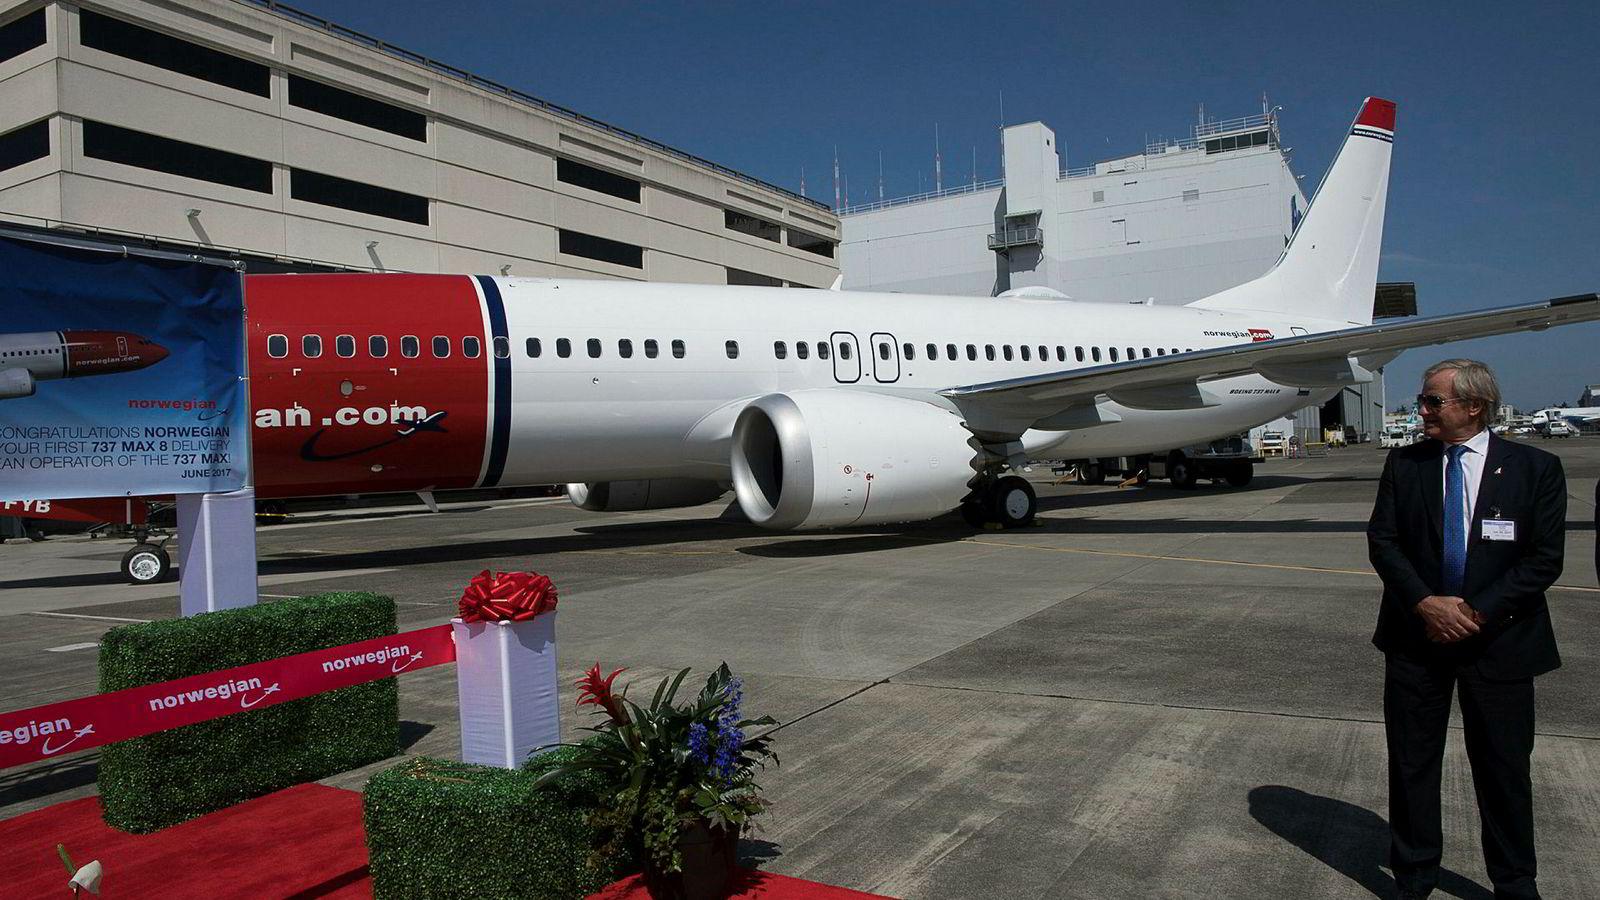 Konsernsjef Bjørn Kjos har sagt at Norwegian skal være lønnsom i år. Her fra da han hentet Norwegians første 737 Max på Boeing Delivery Center i Seattle i juni 2017.